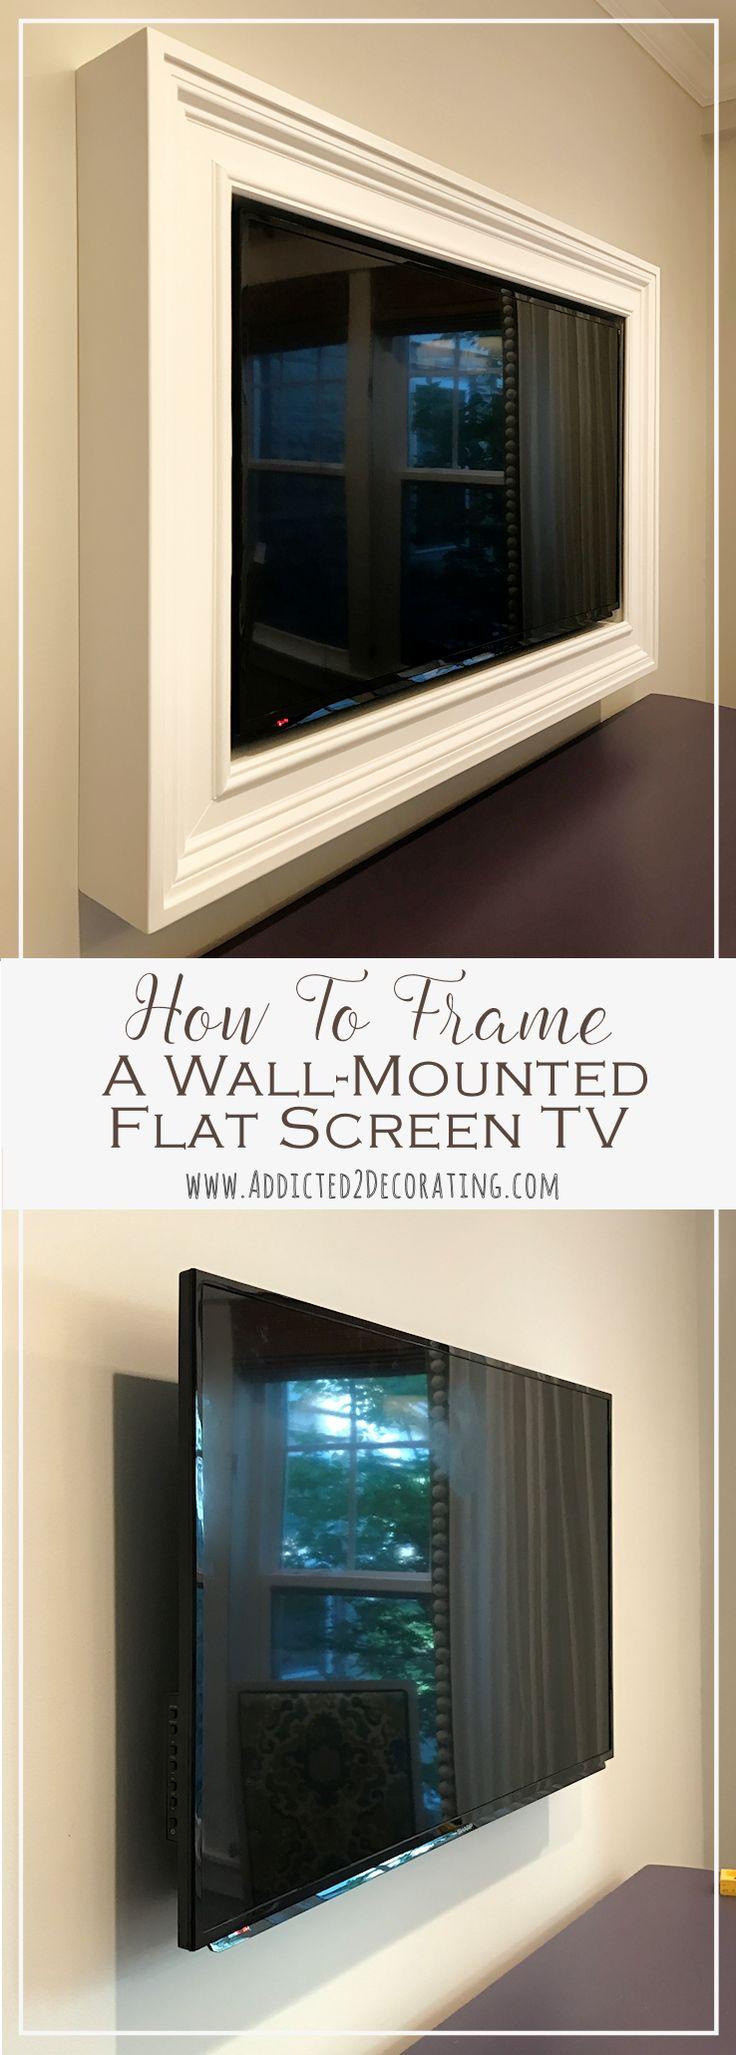 Custom diy frame for wallmounted tv finished tv in